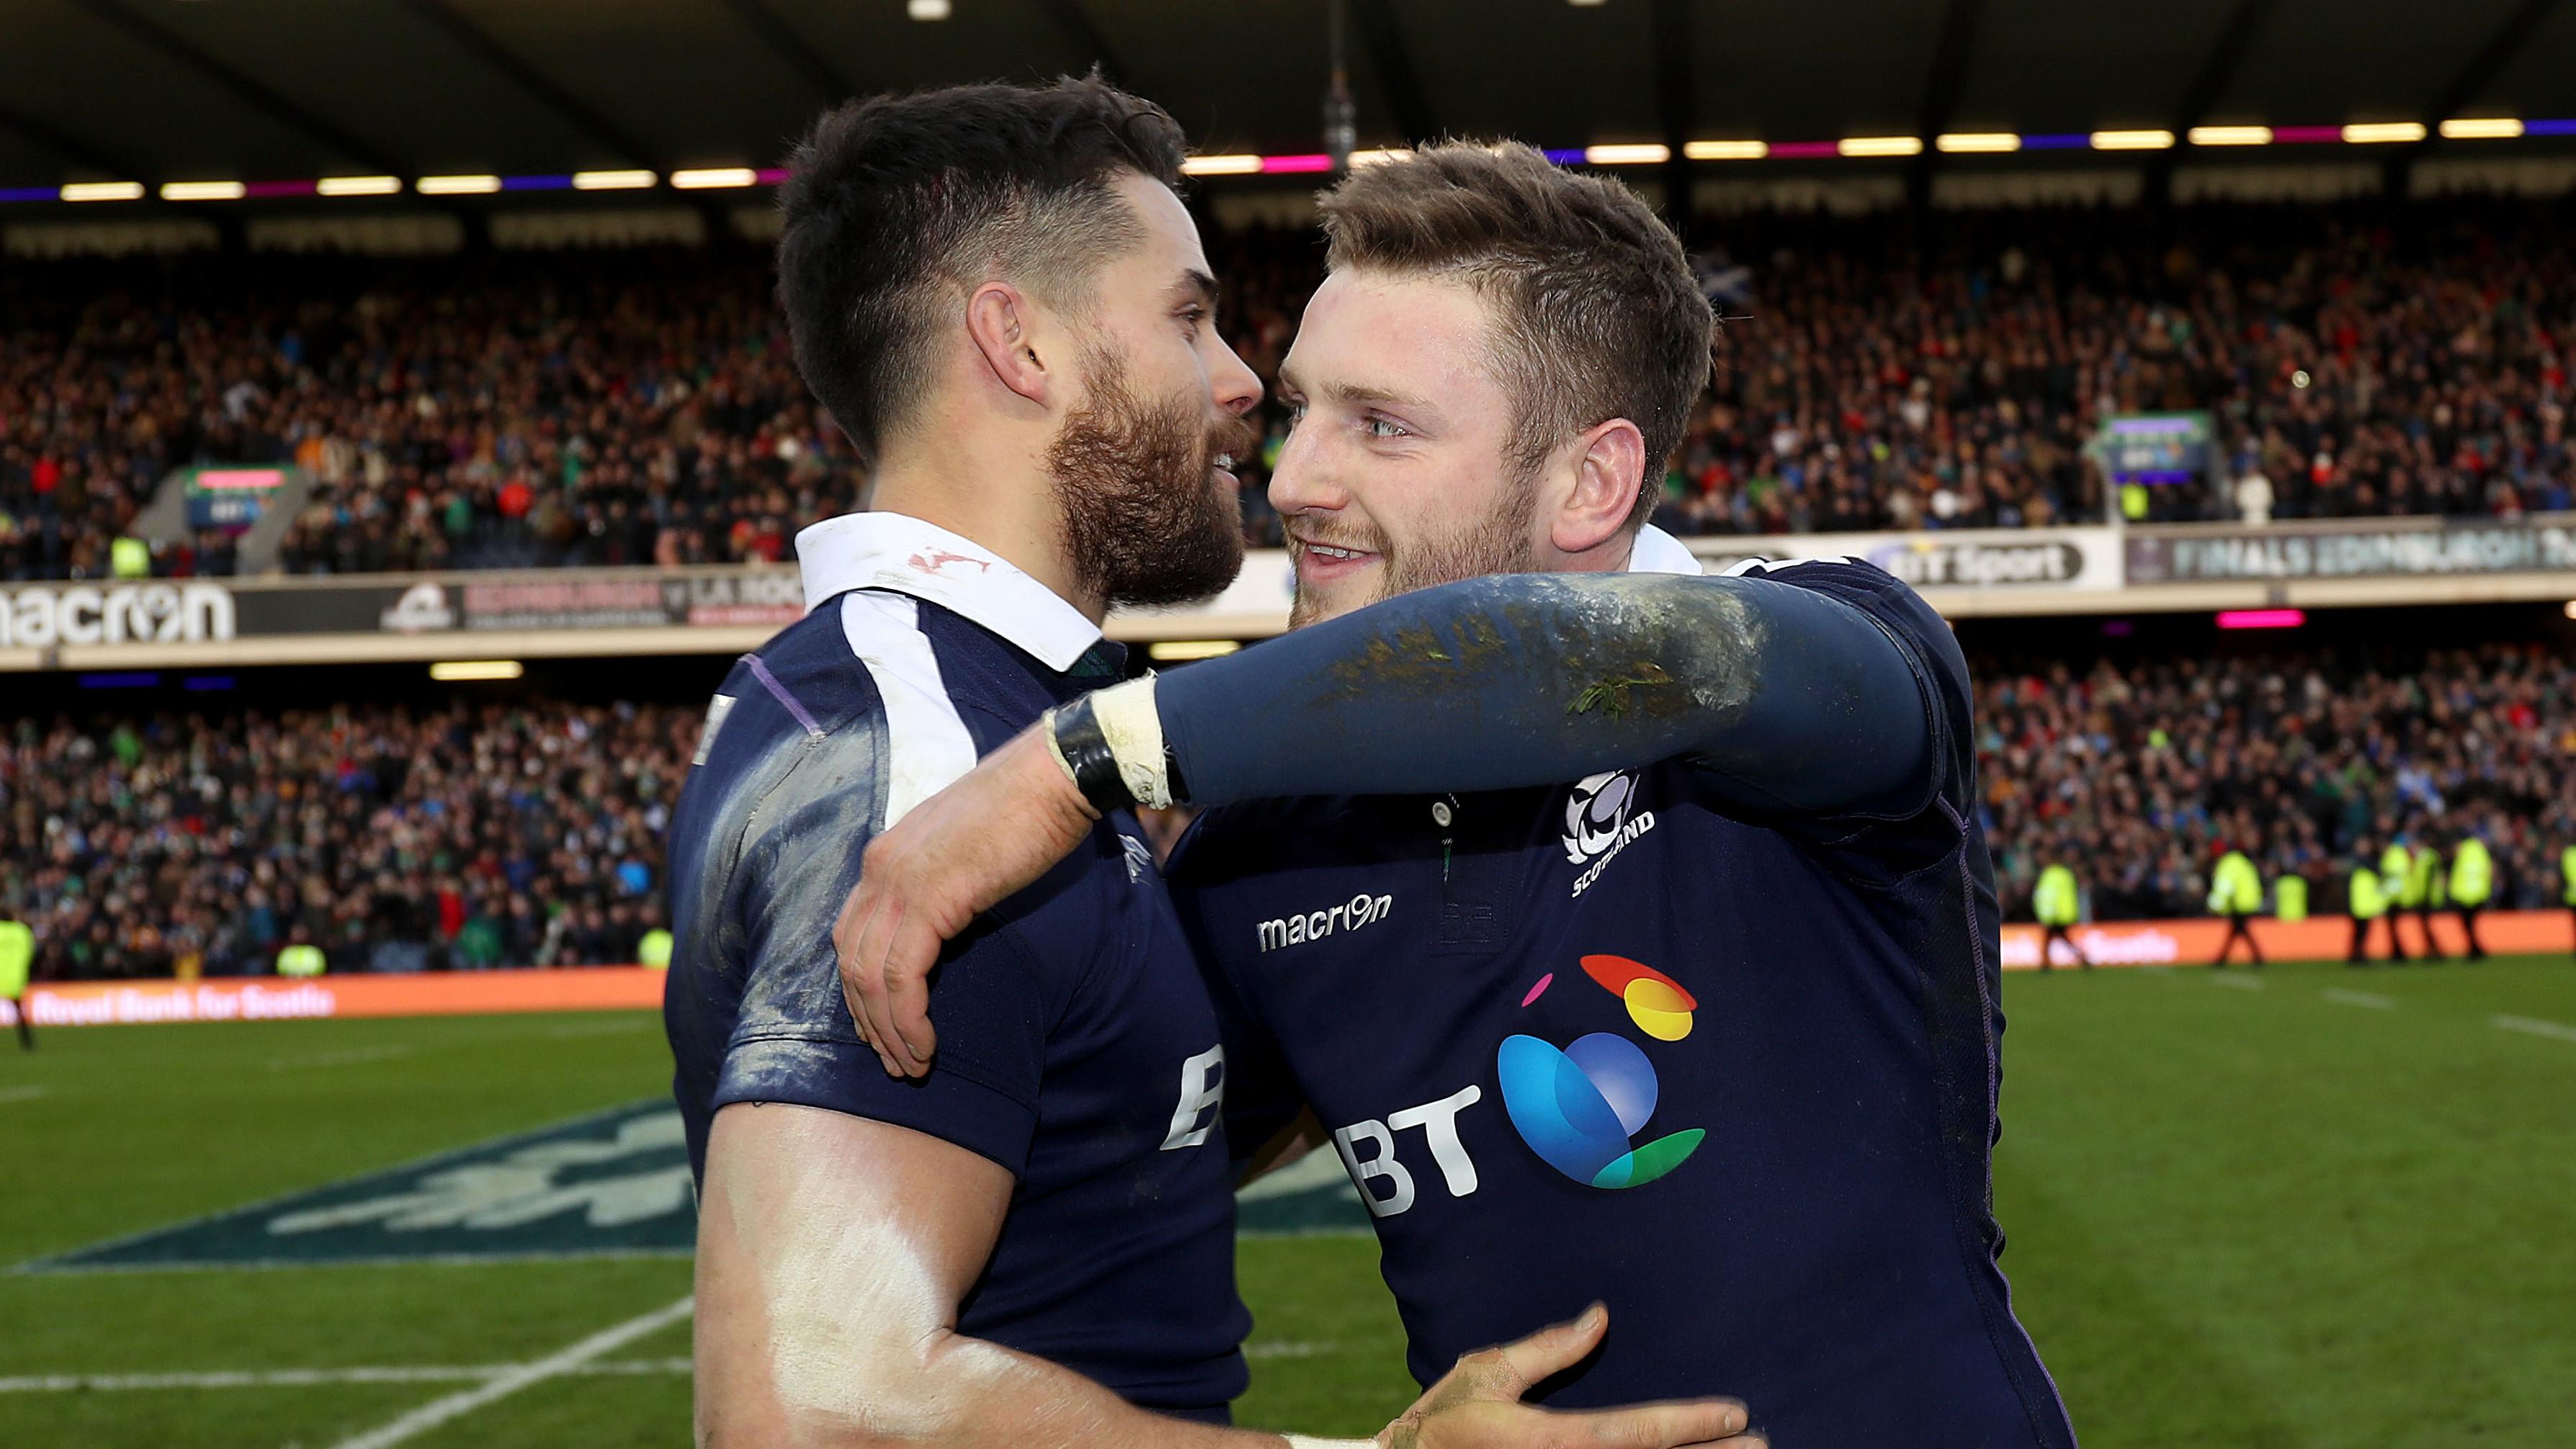 Wins for Scotland England and Ireland